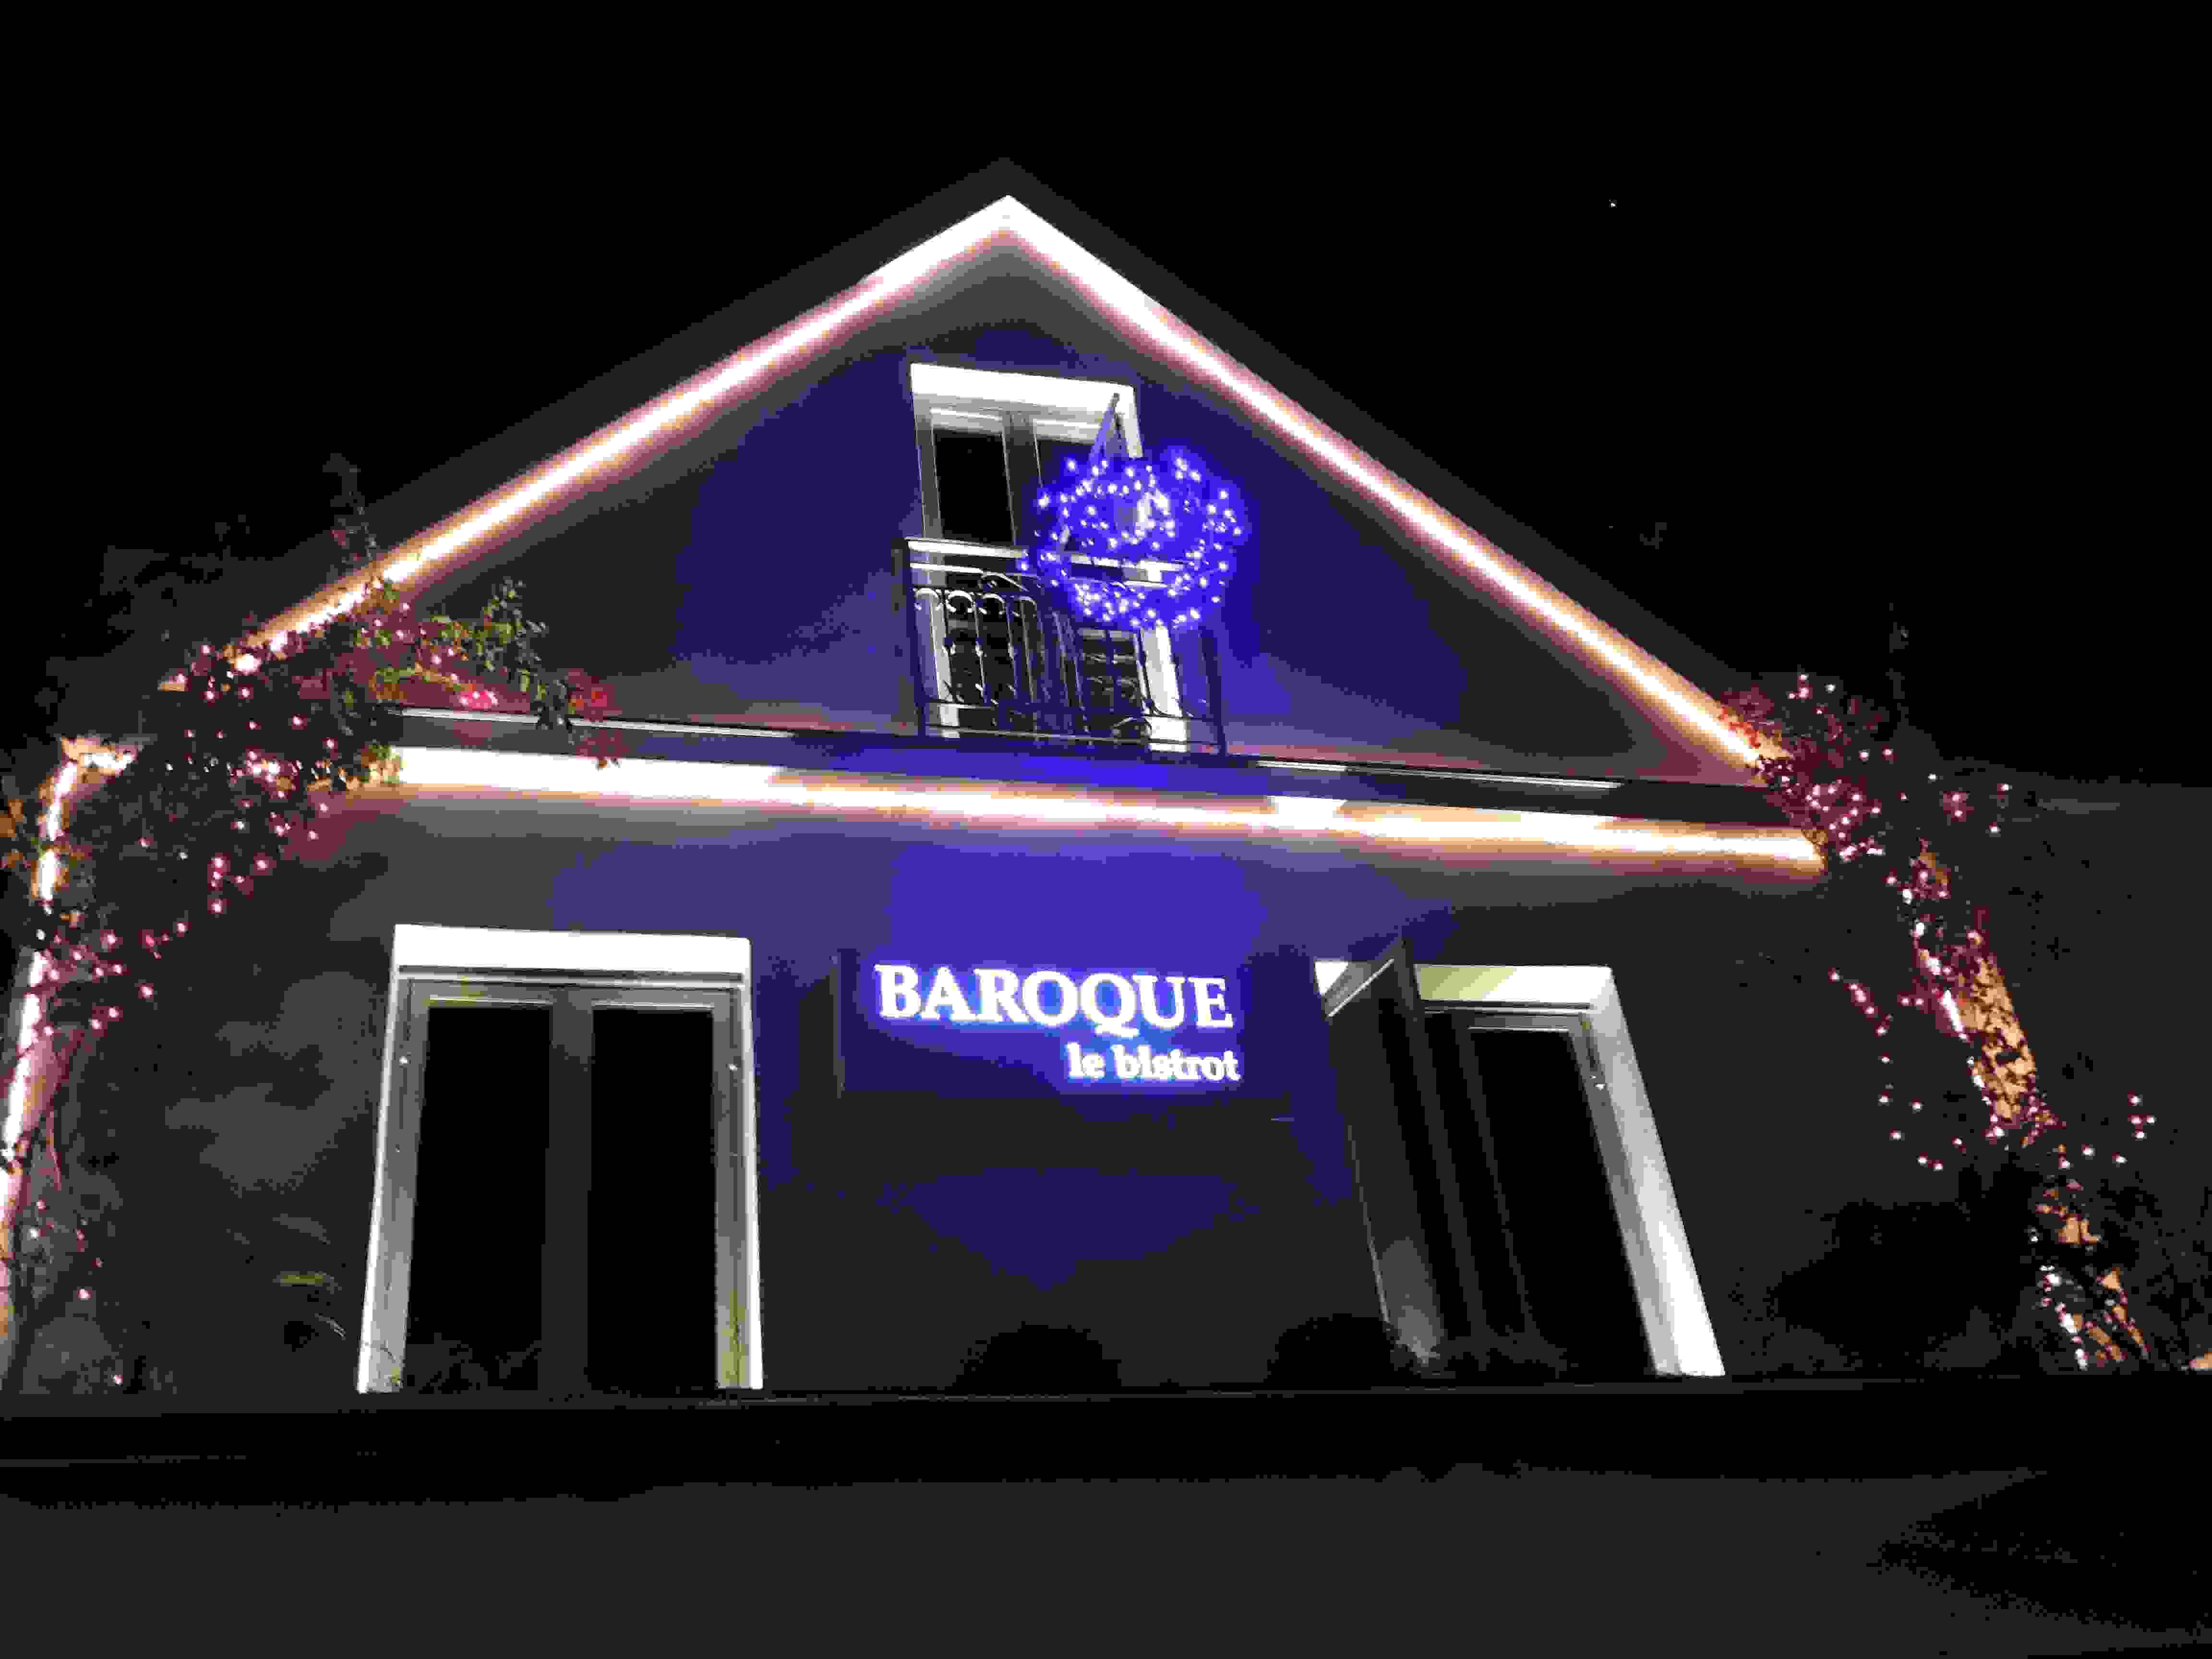 BAROQUE: IT' S FRIDAY I'M IN LOVE (ΦΩΤΟ & ΒΙΝΤΕΟ) Γράφει η Παυλίνα Σταμάτη